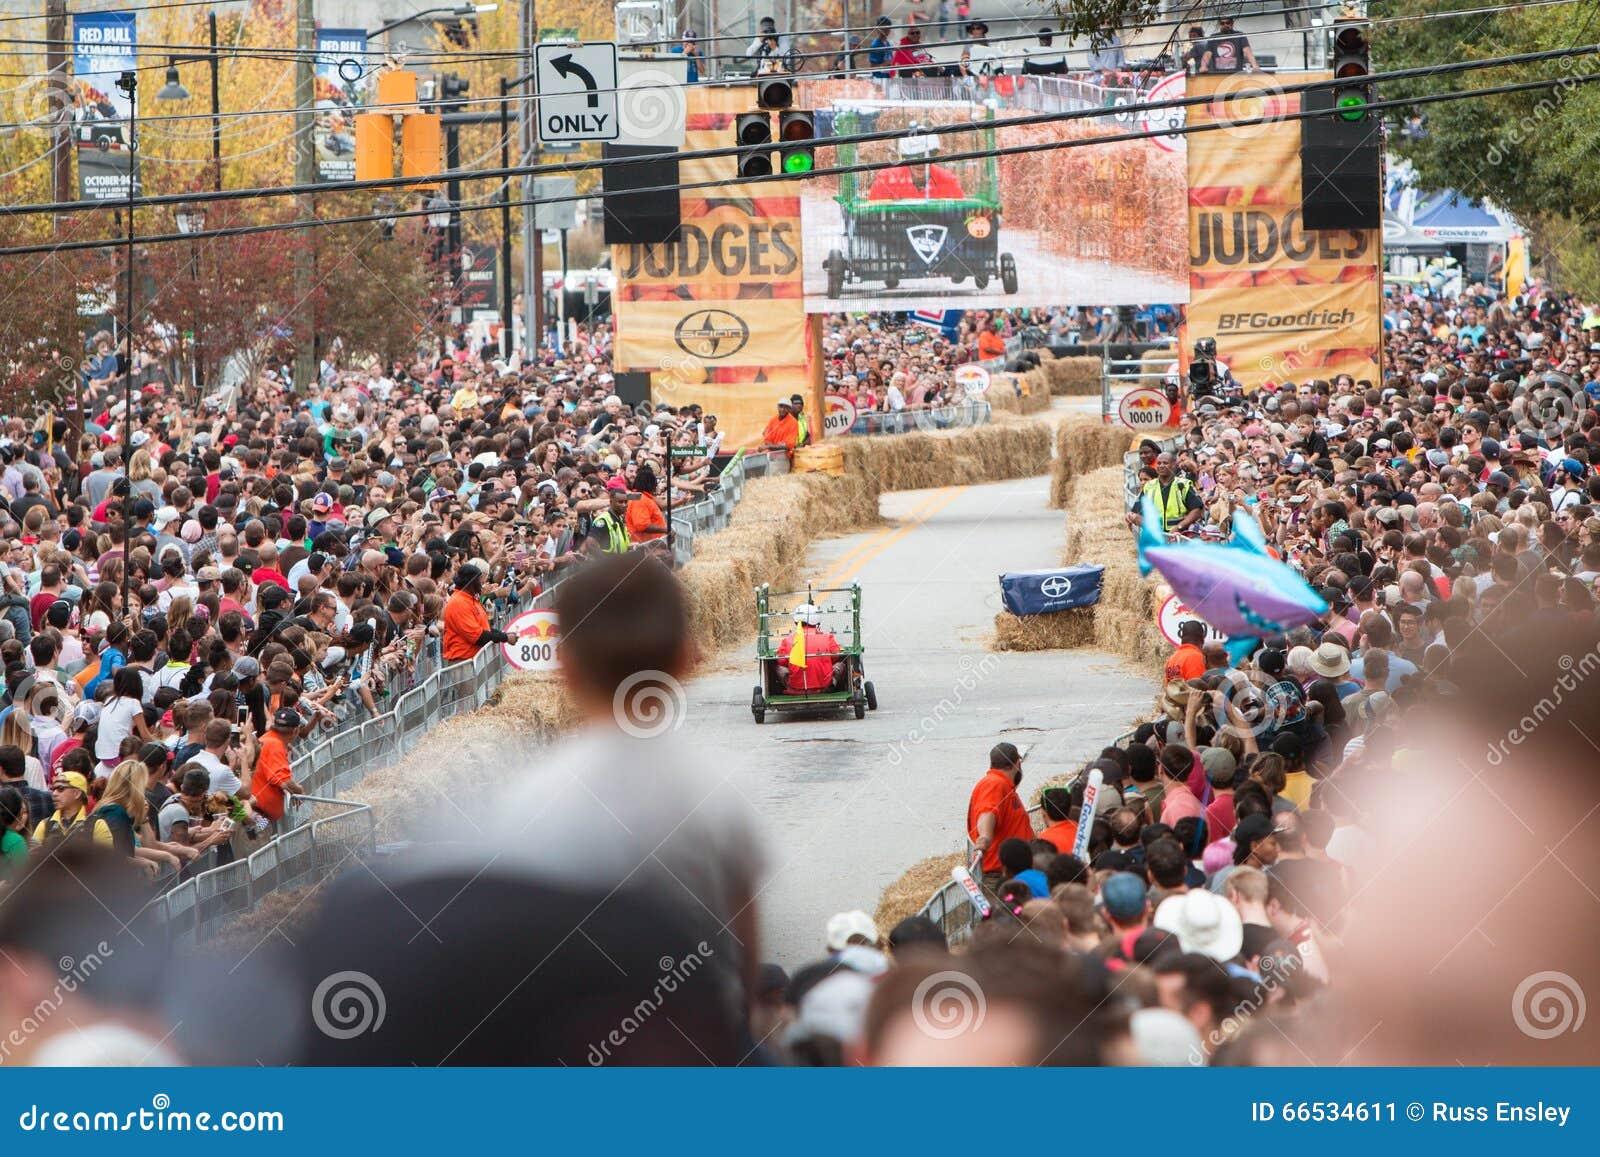 Red Bull Soap Box Derby >> Thousands Of Spectators Watch Atlanta Soap Box Derby Race